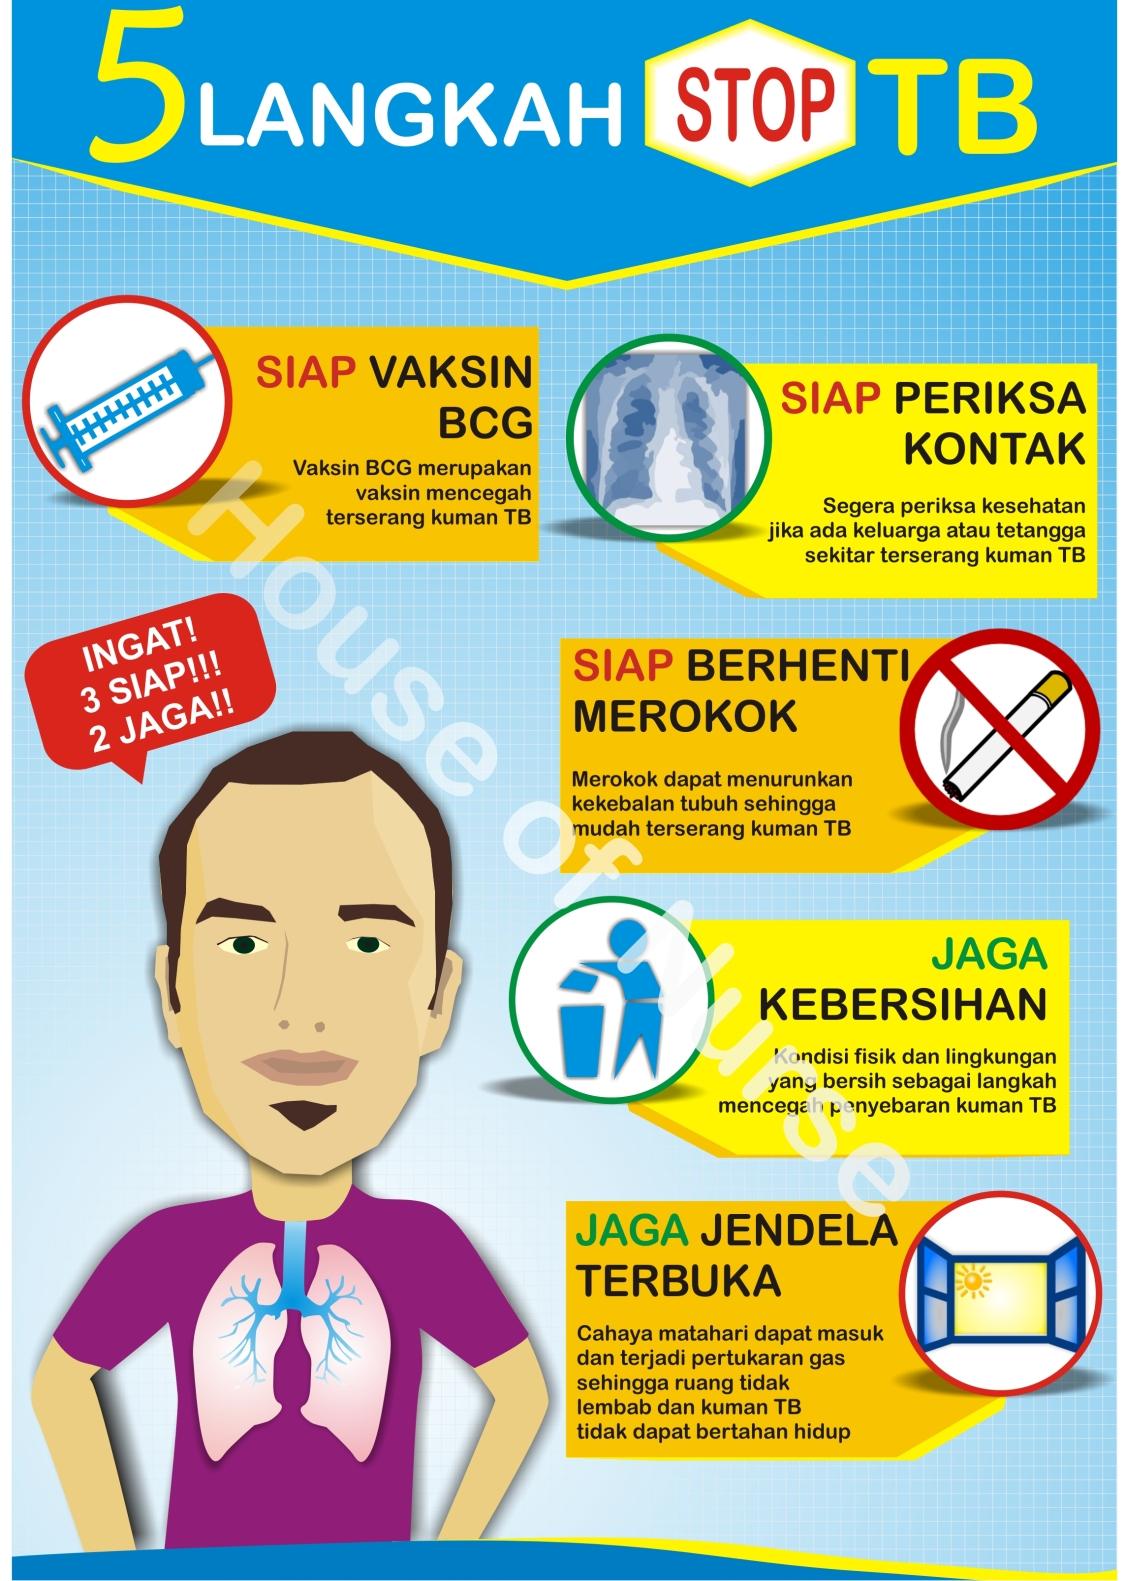 Kumpulan Contoh Desain Poster Kesehatan